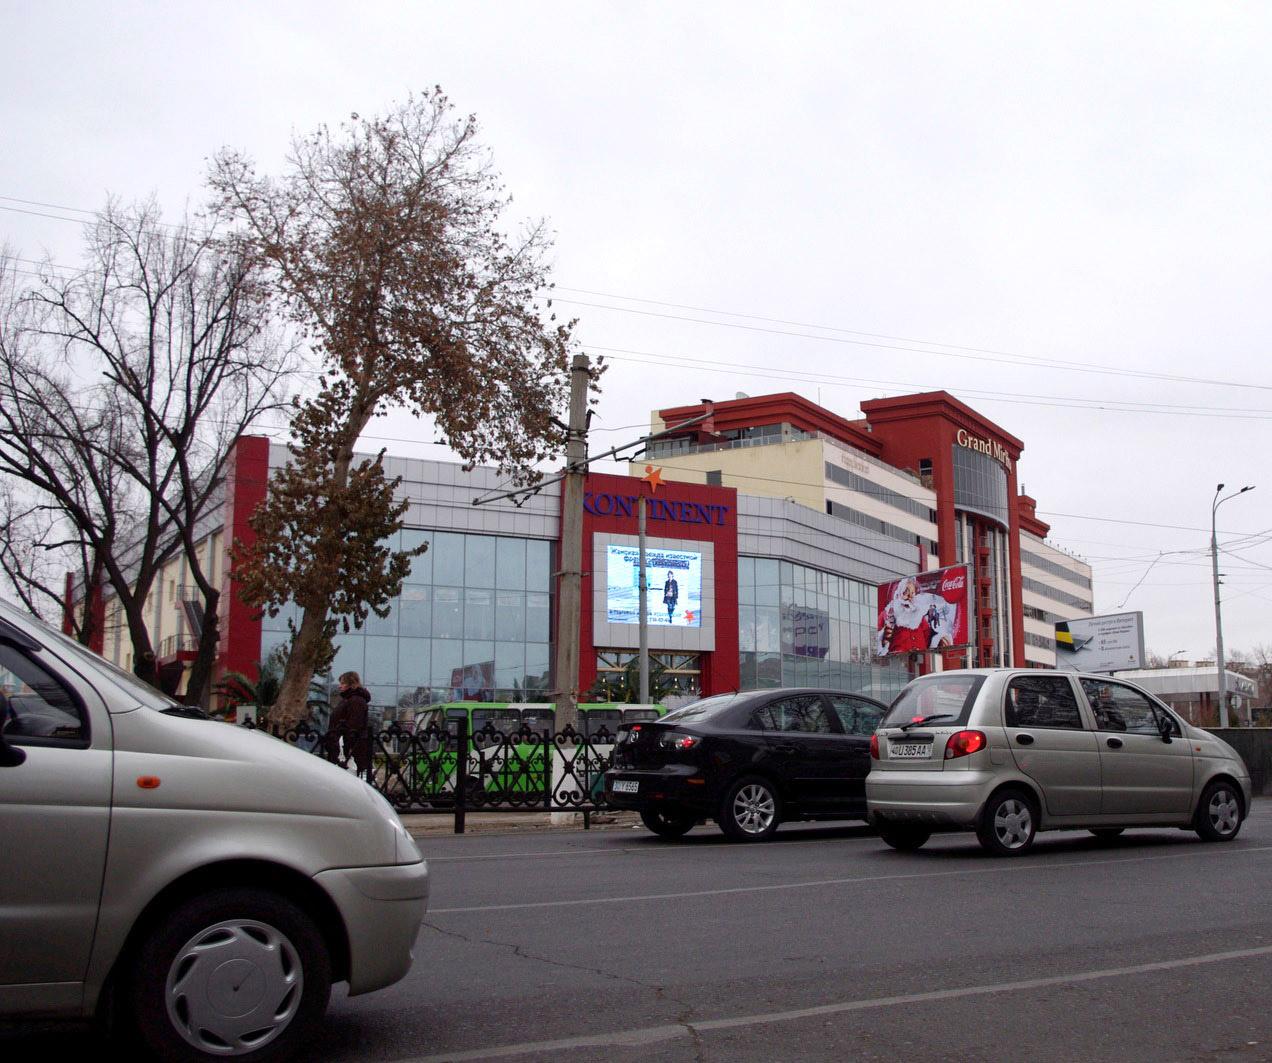 http://www.tourblogger.ru/sites/default/files/u29097/_igp1316.jpg